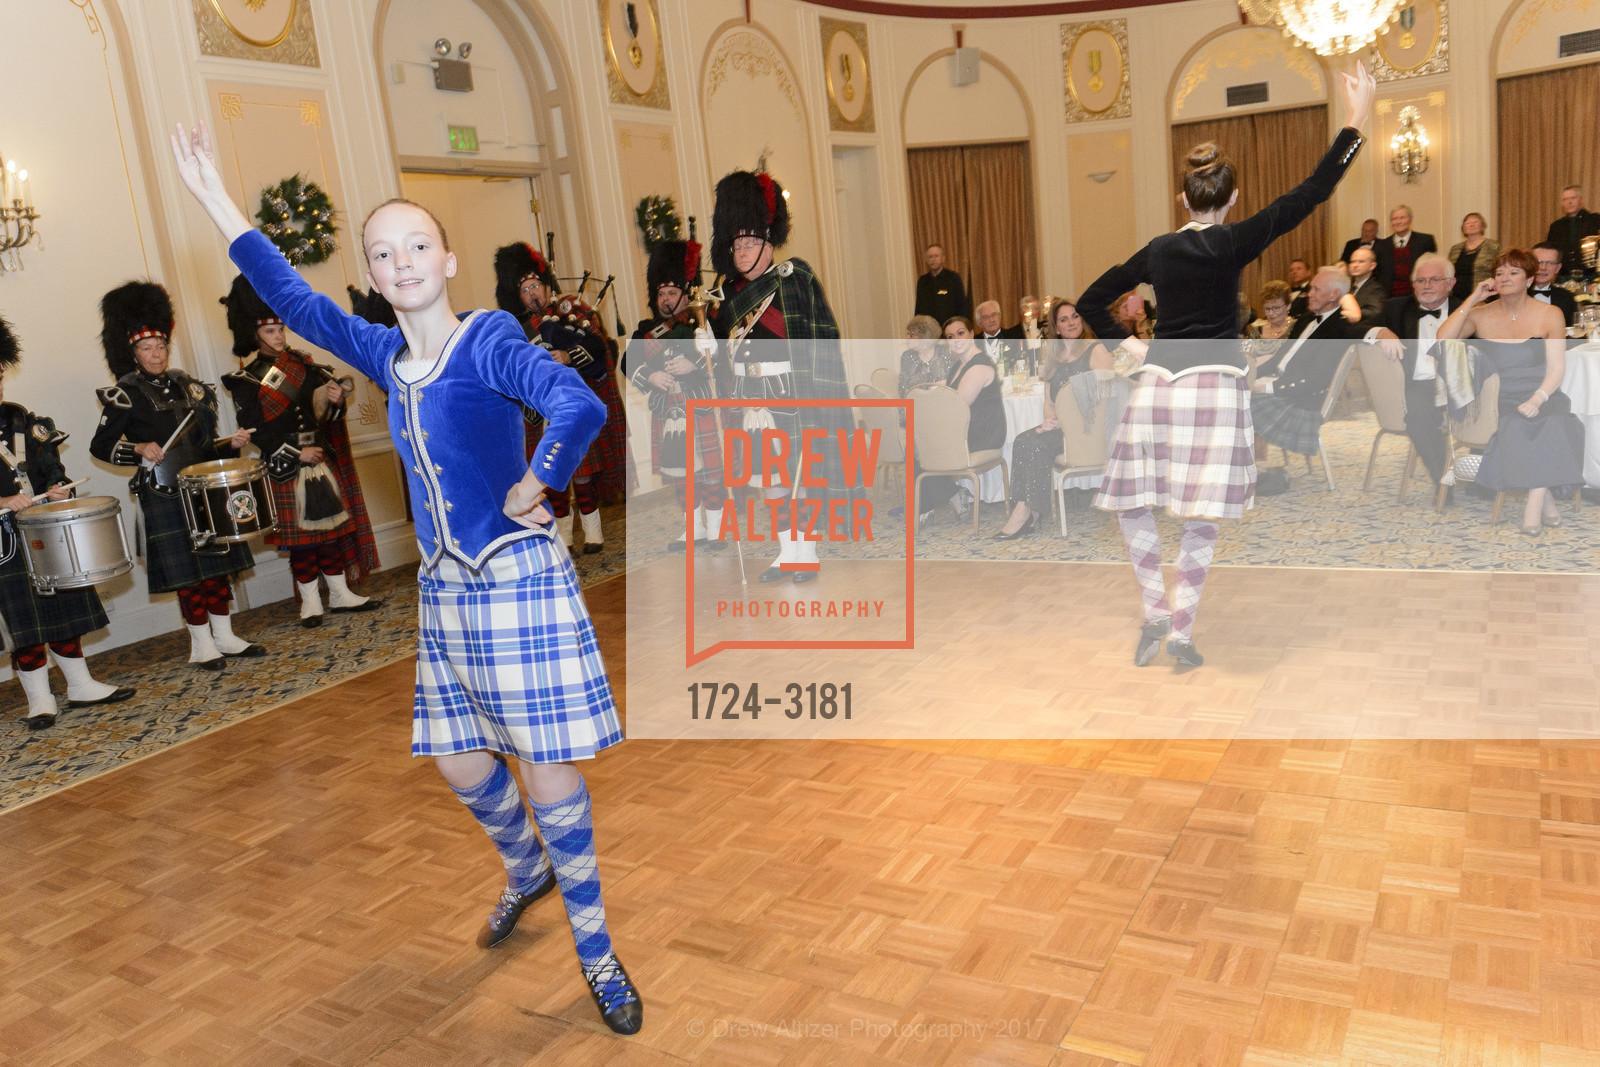 Performance, Photo #1724-3181